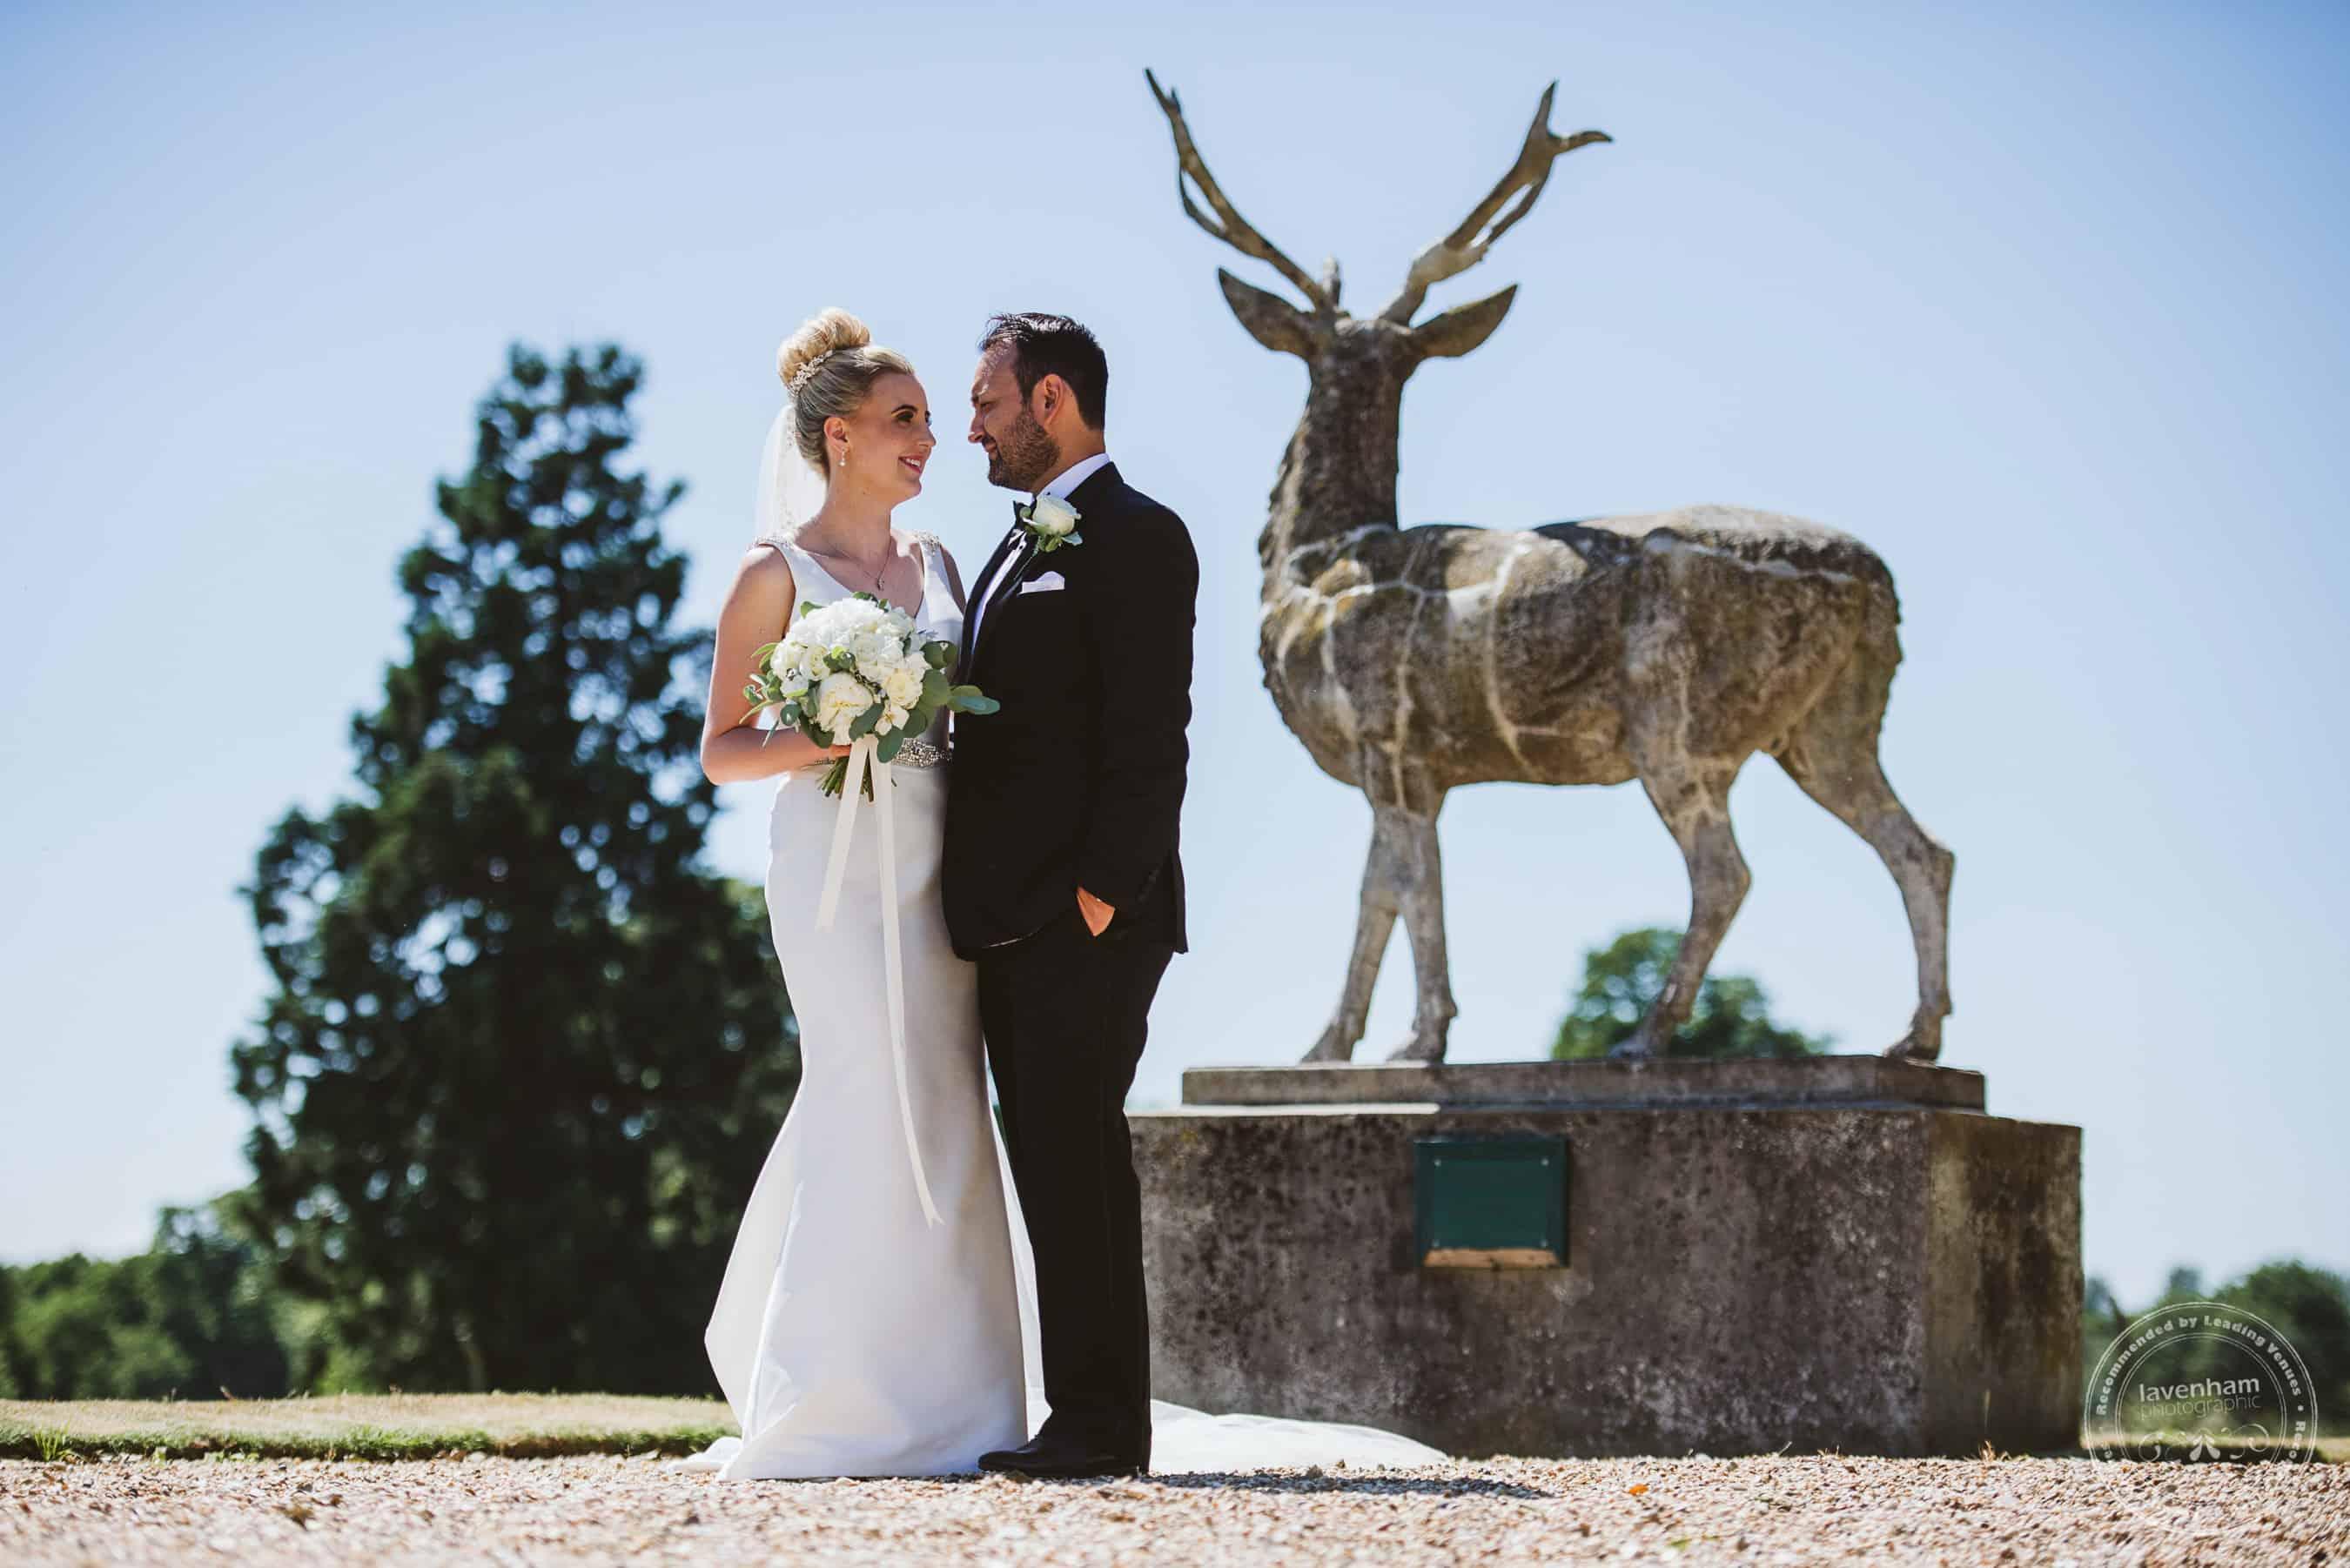 220618 Gosfield Hall Wedding Photography Lavenham Photographic 0134